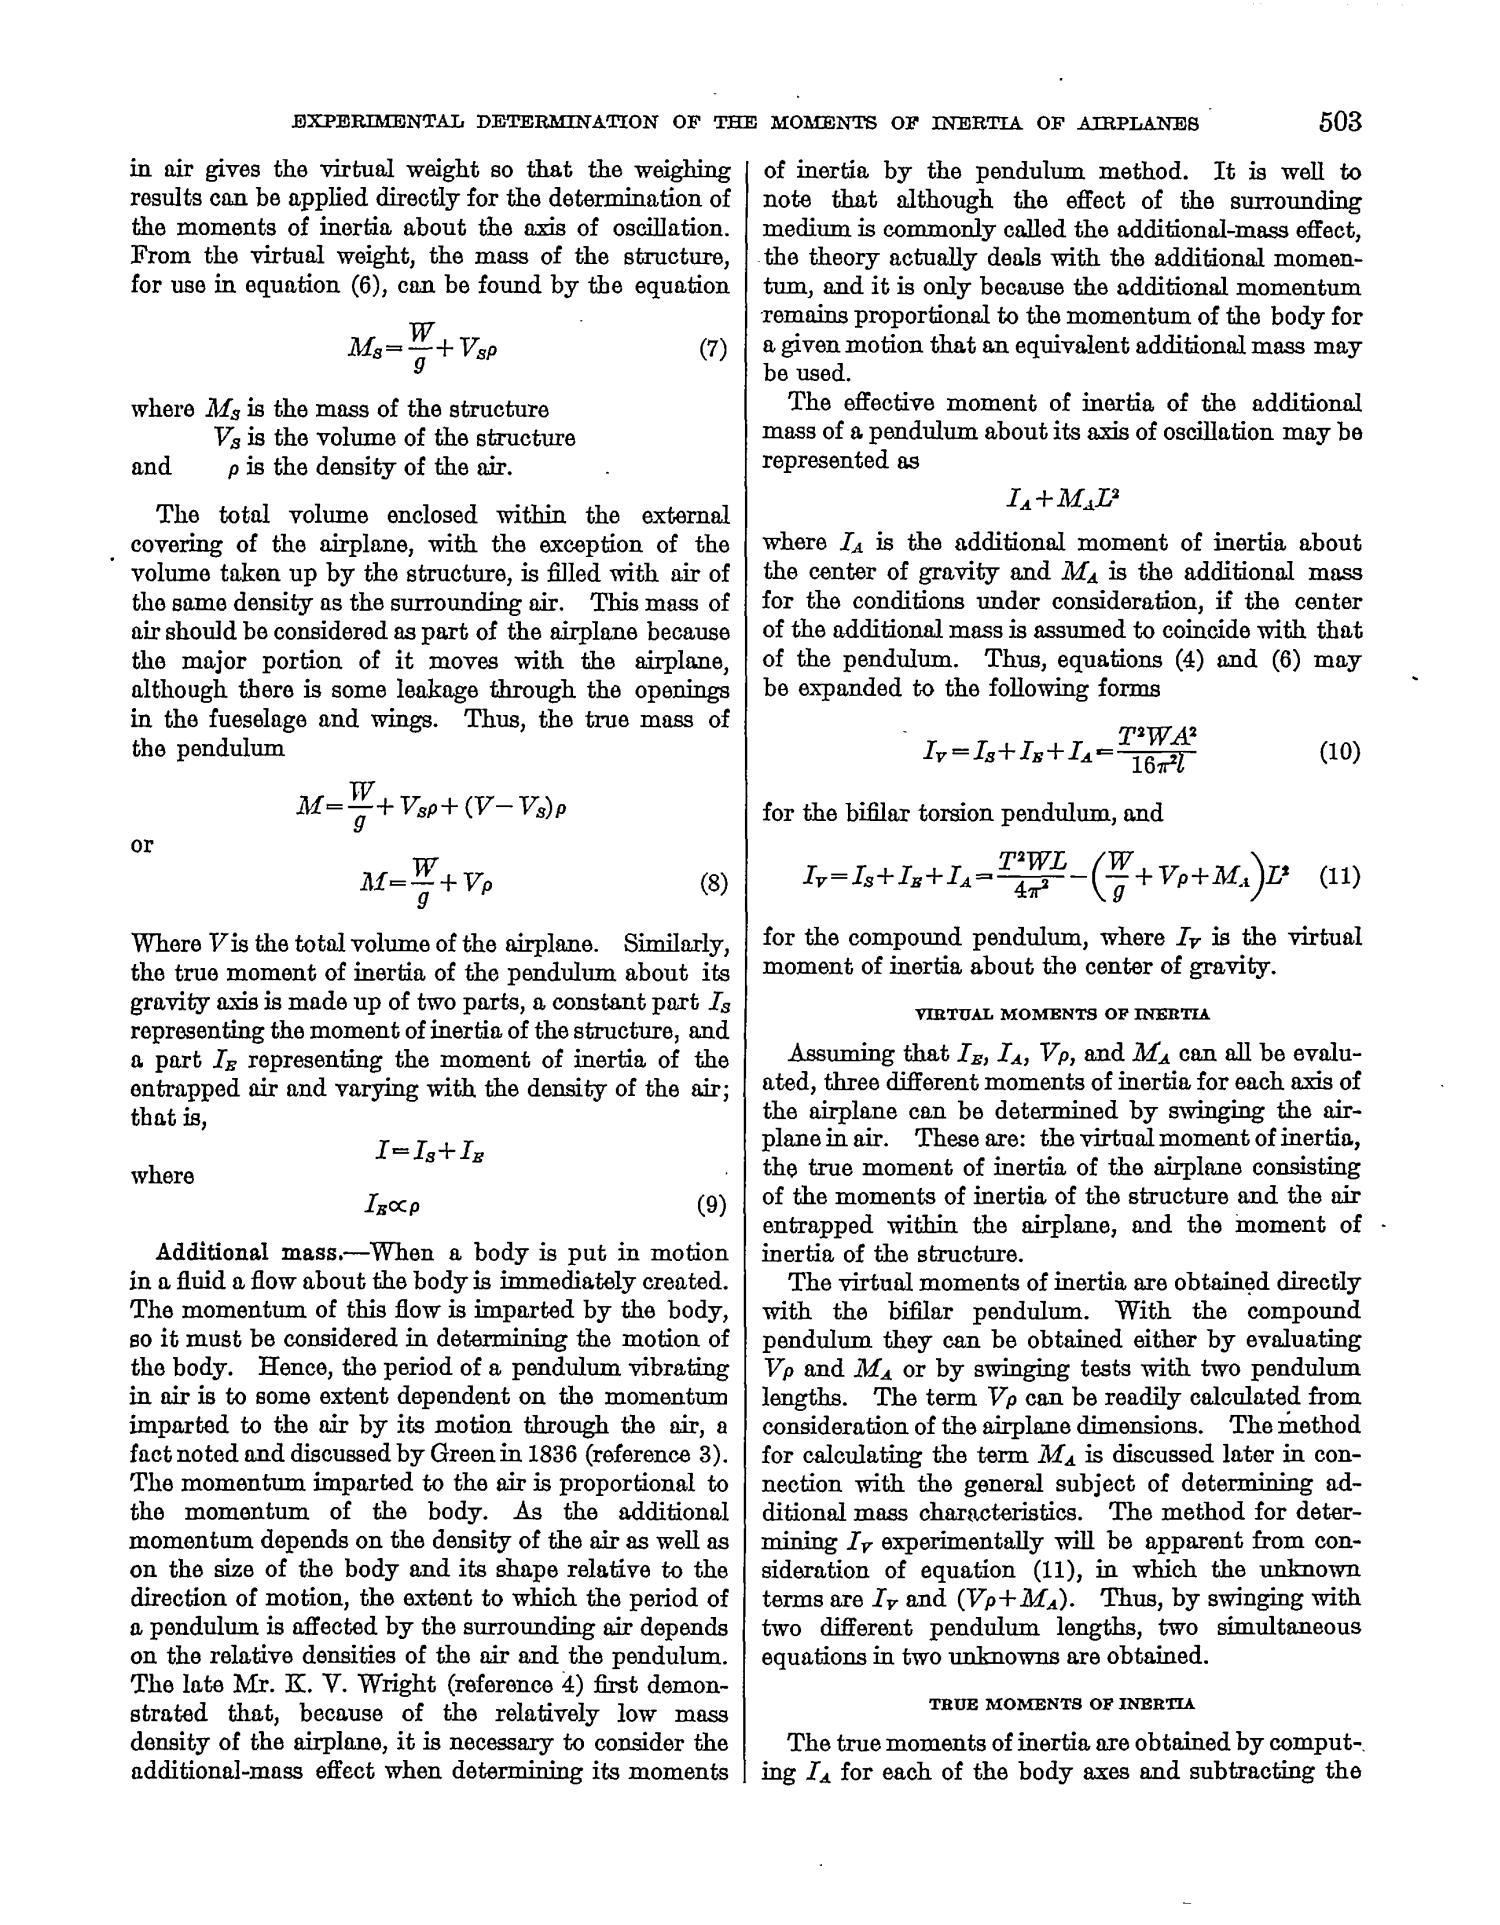 bifilar pendulum period equation